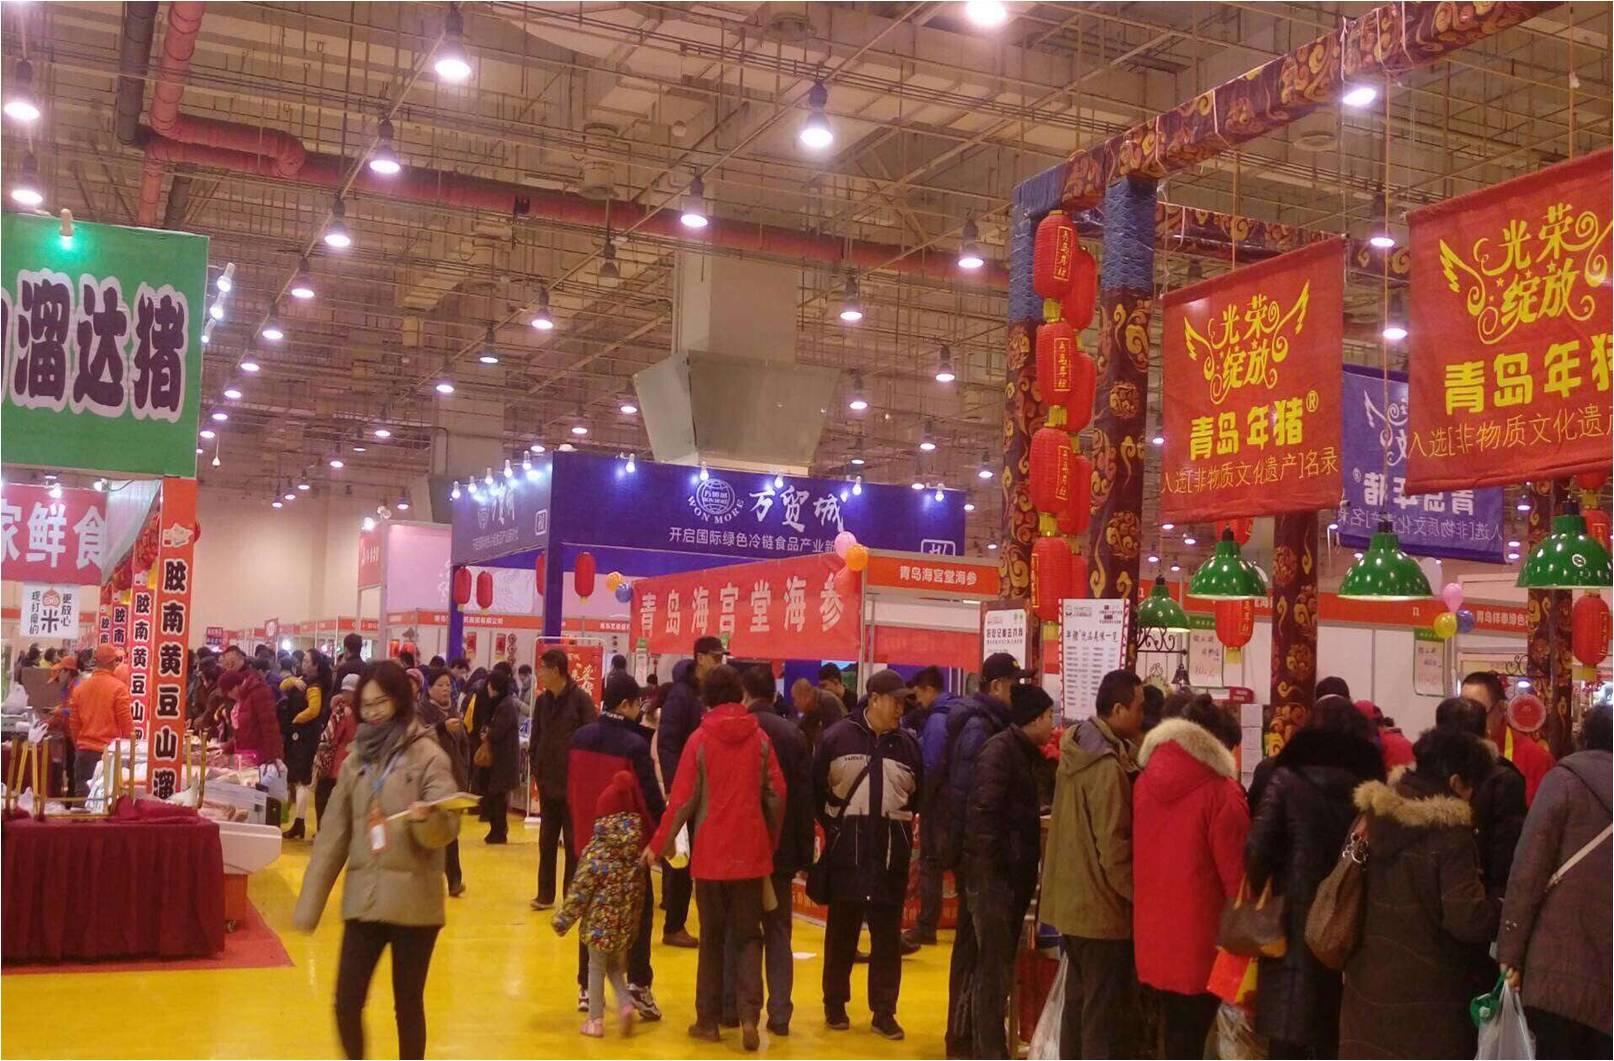 beplay登录迎新春特色年货购物节